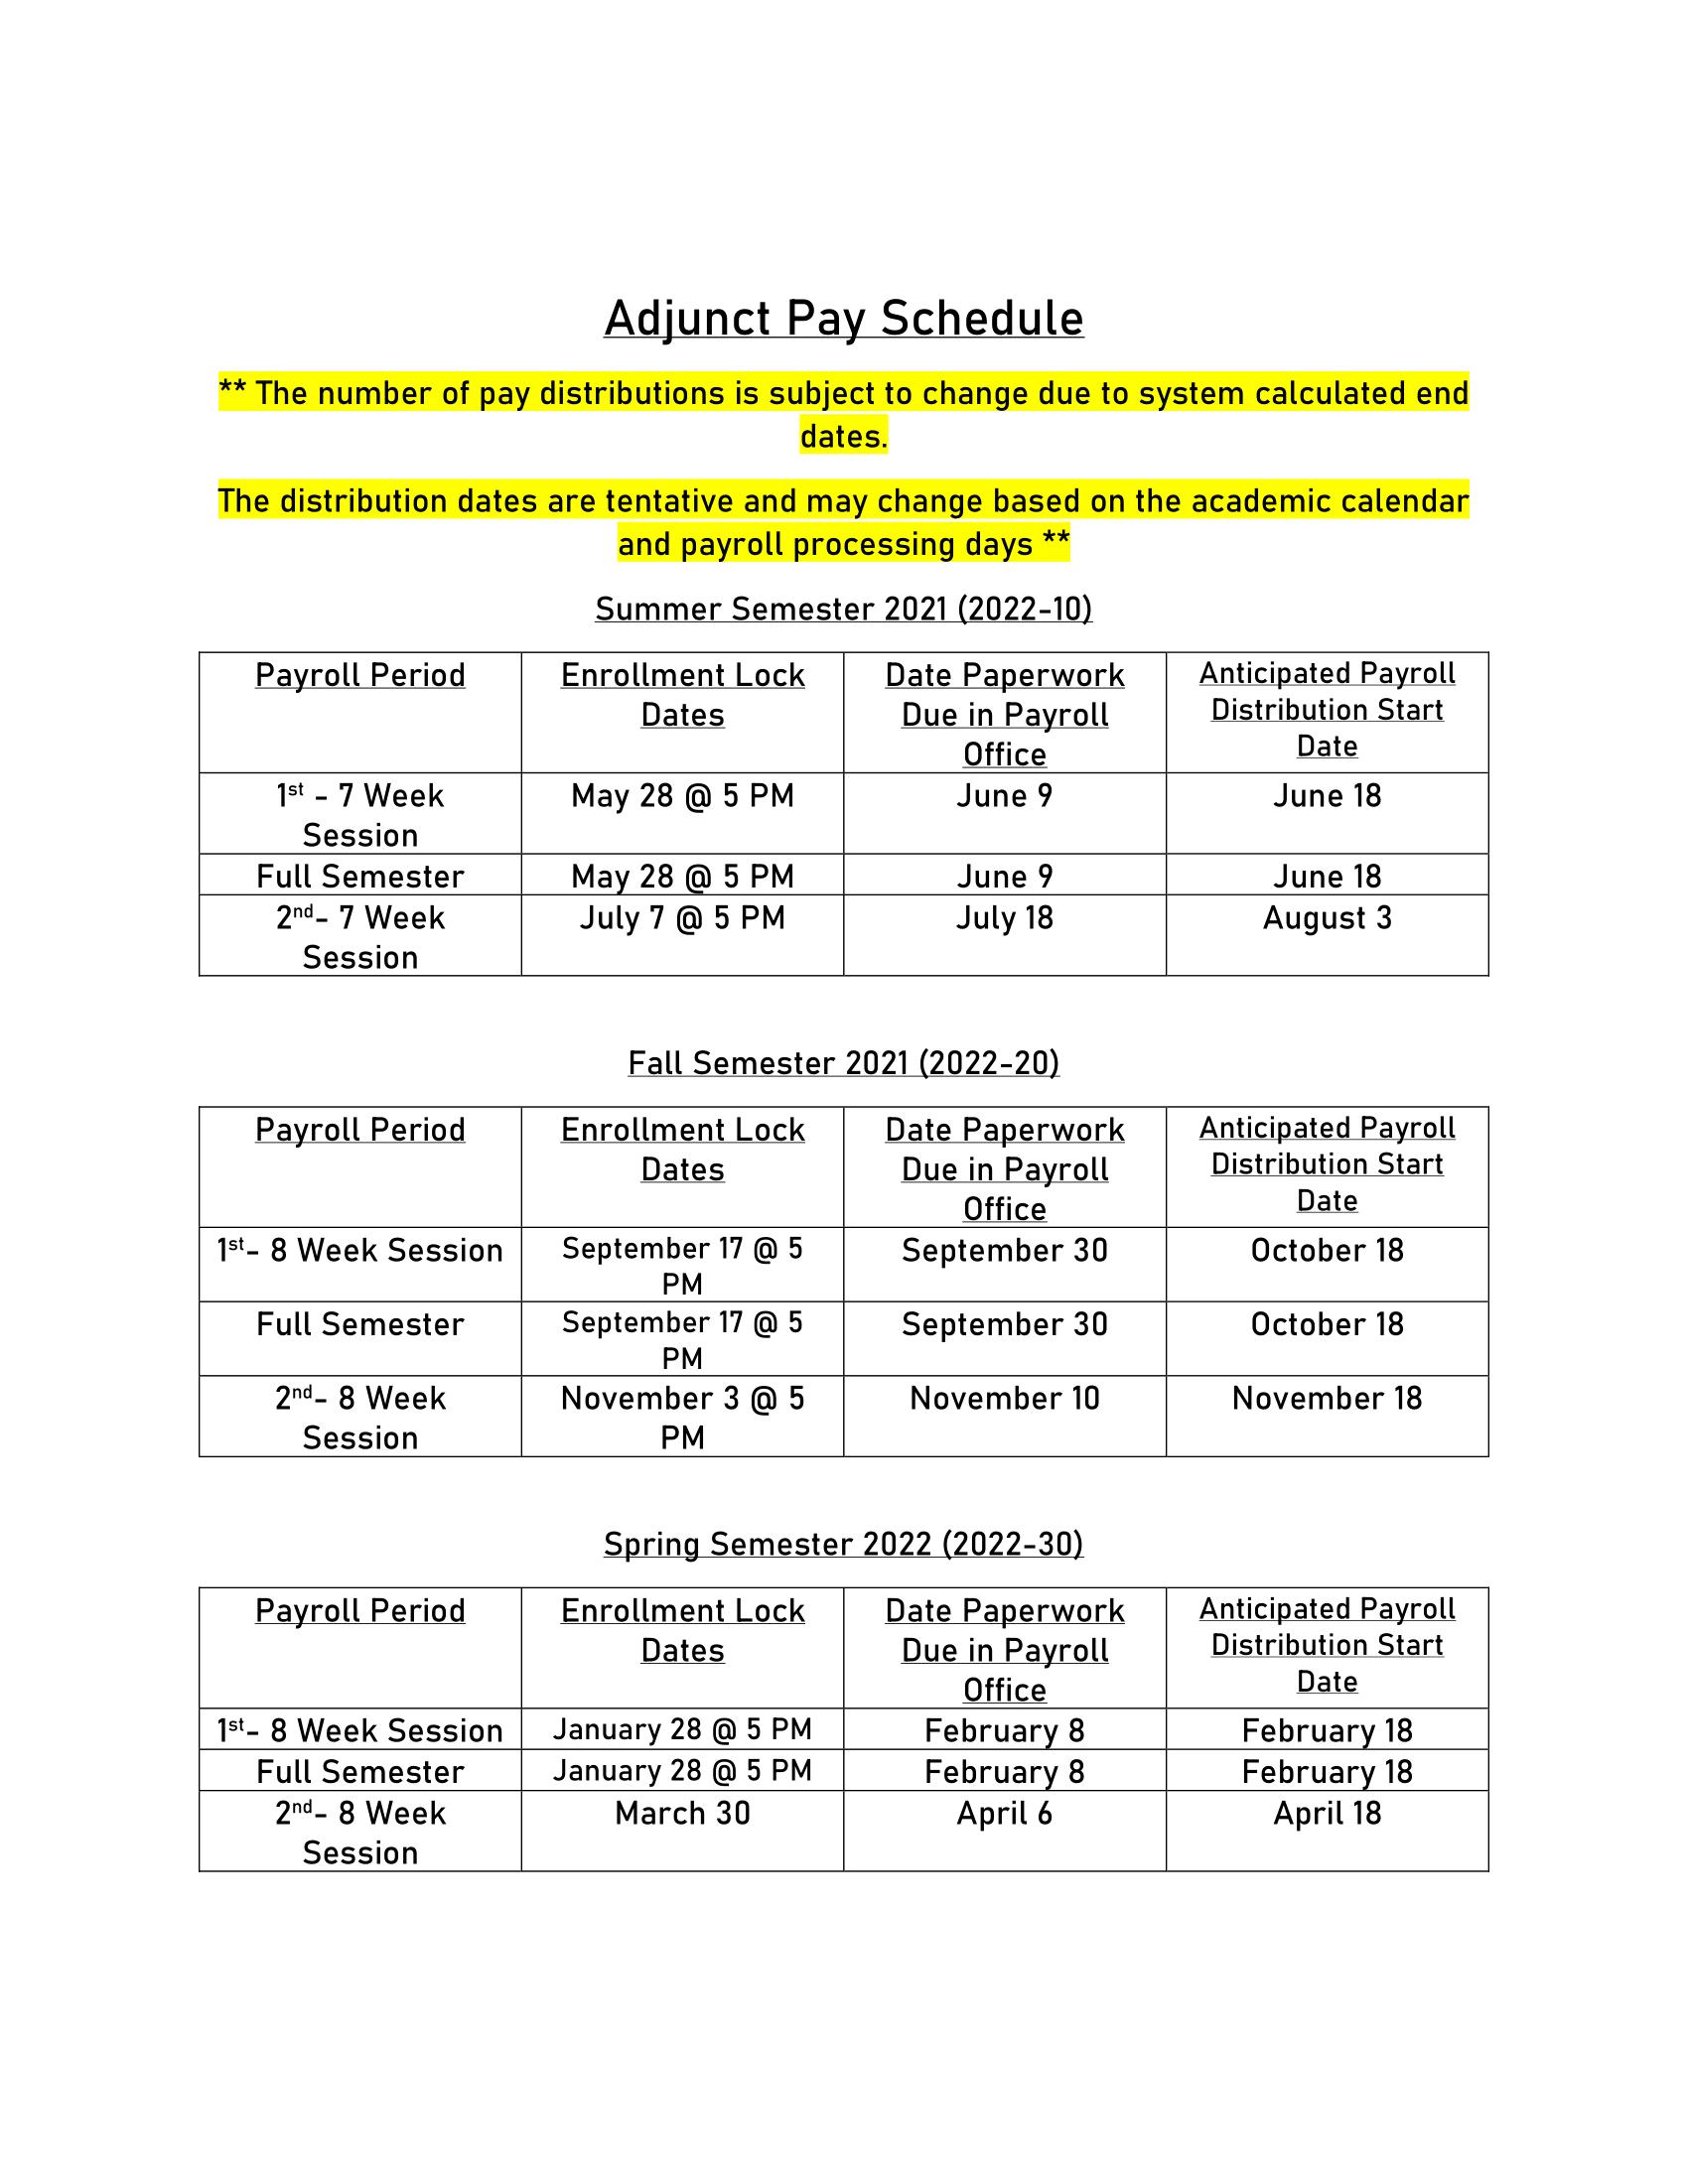 Adjunct Pay Schedule 2019